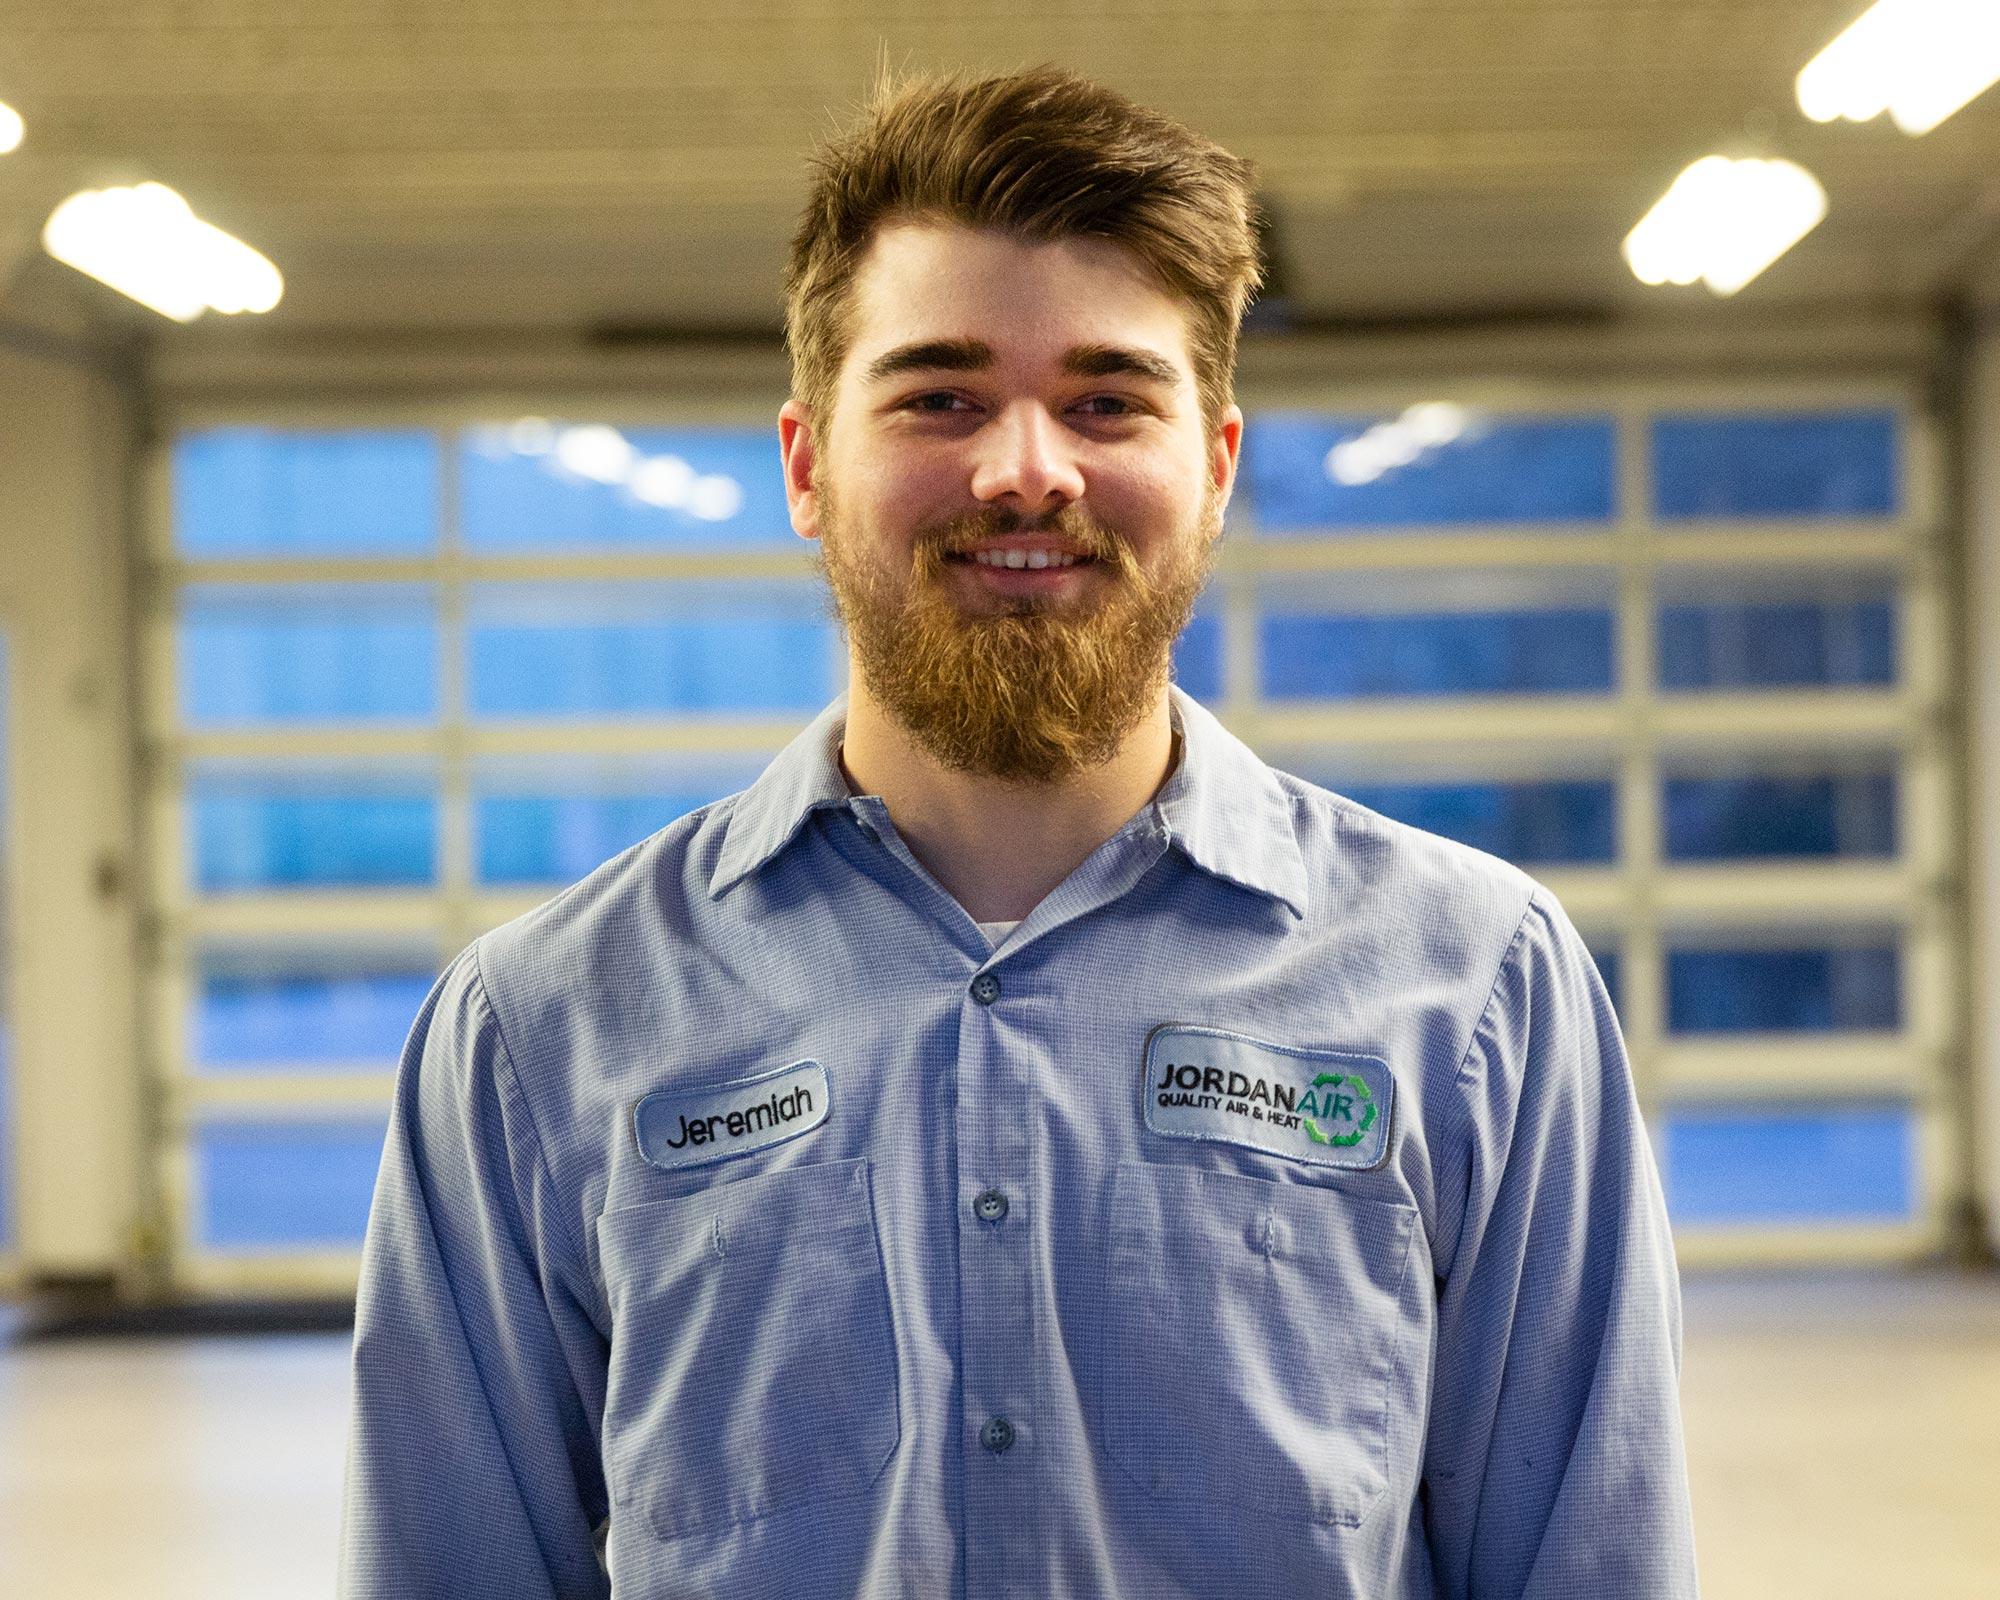 Jeremiah-Jordan-(service-technician).jpg